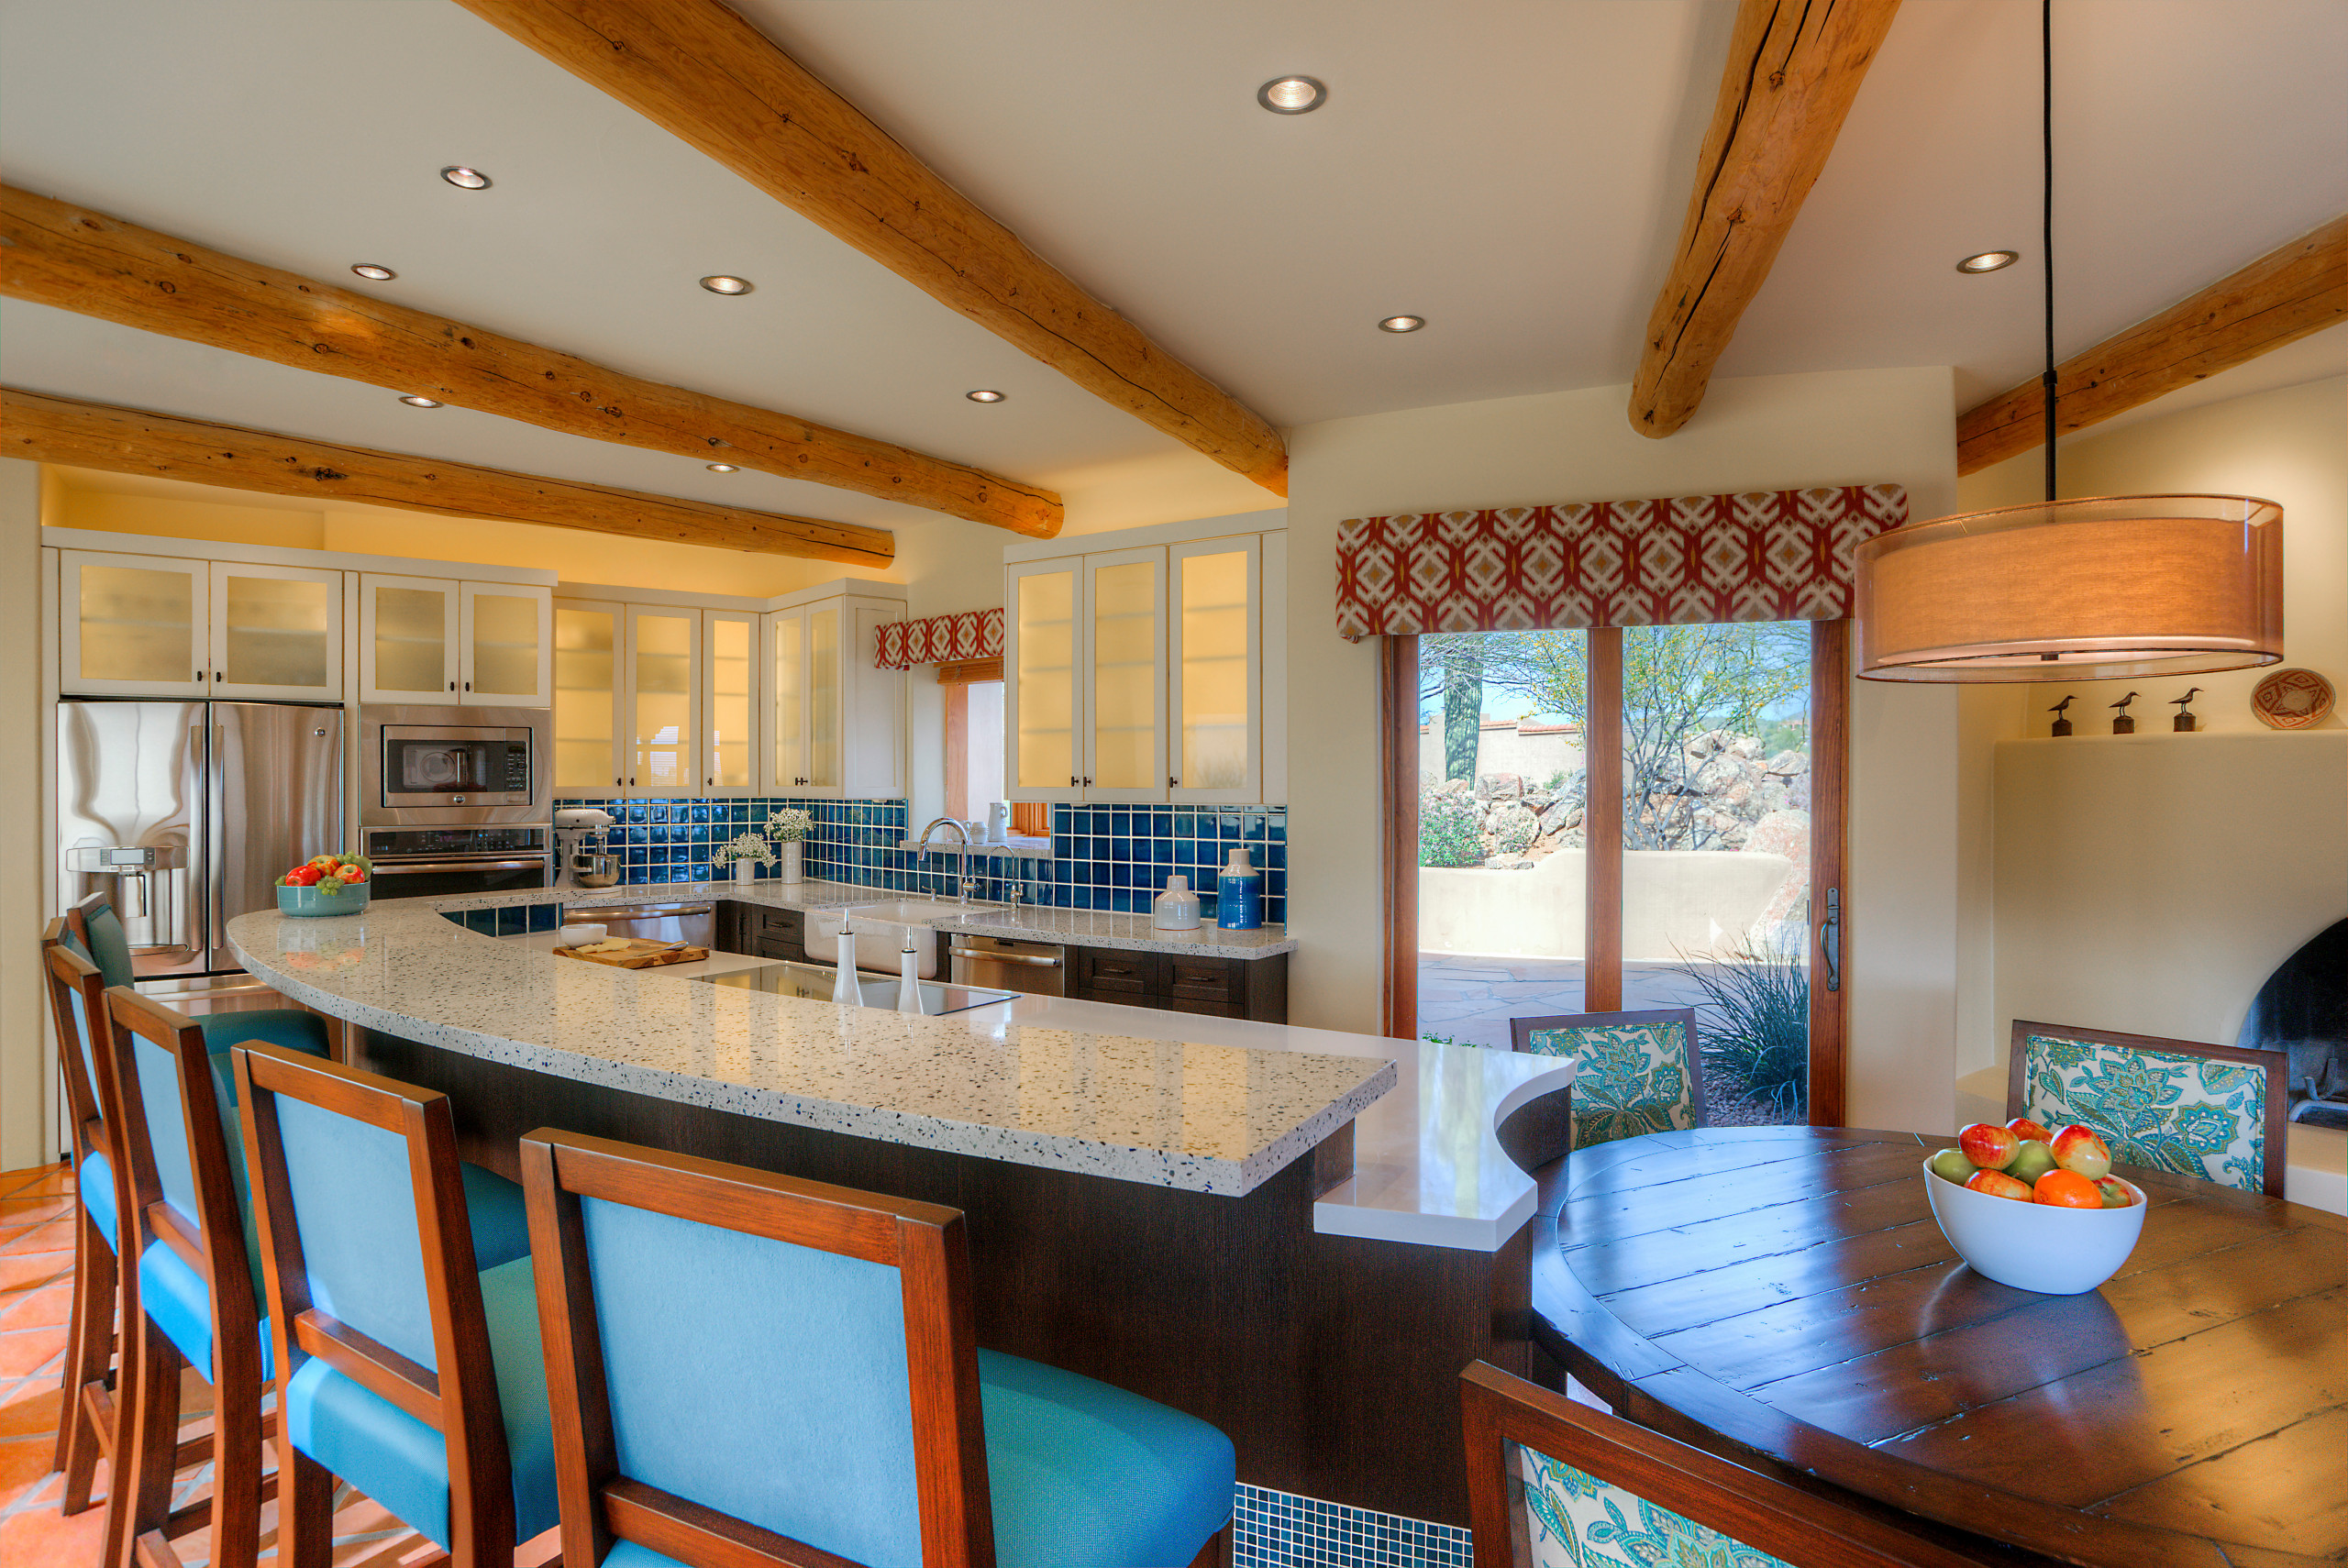 Territorial Update - Kitchen